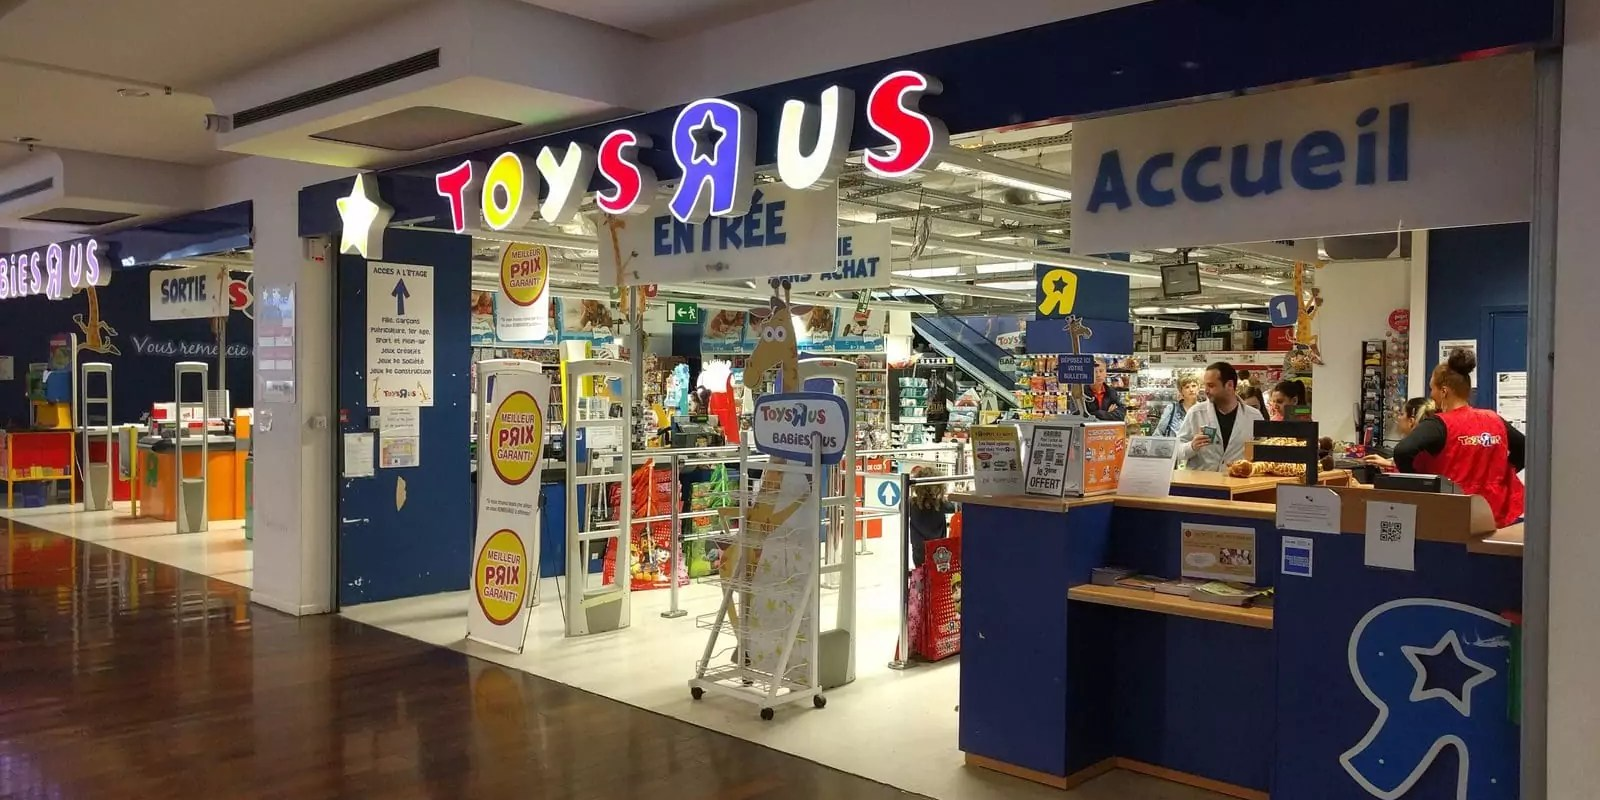 En juin, Toys R Us ferme son magasin de Strasbourg